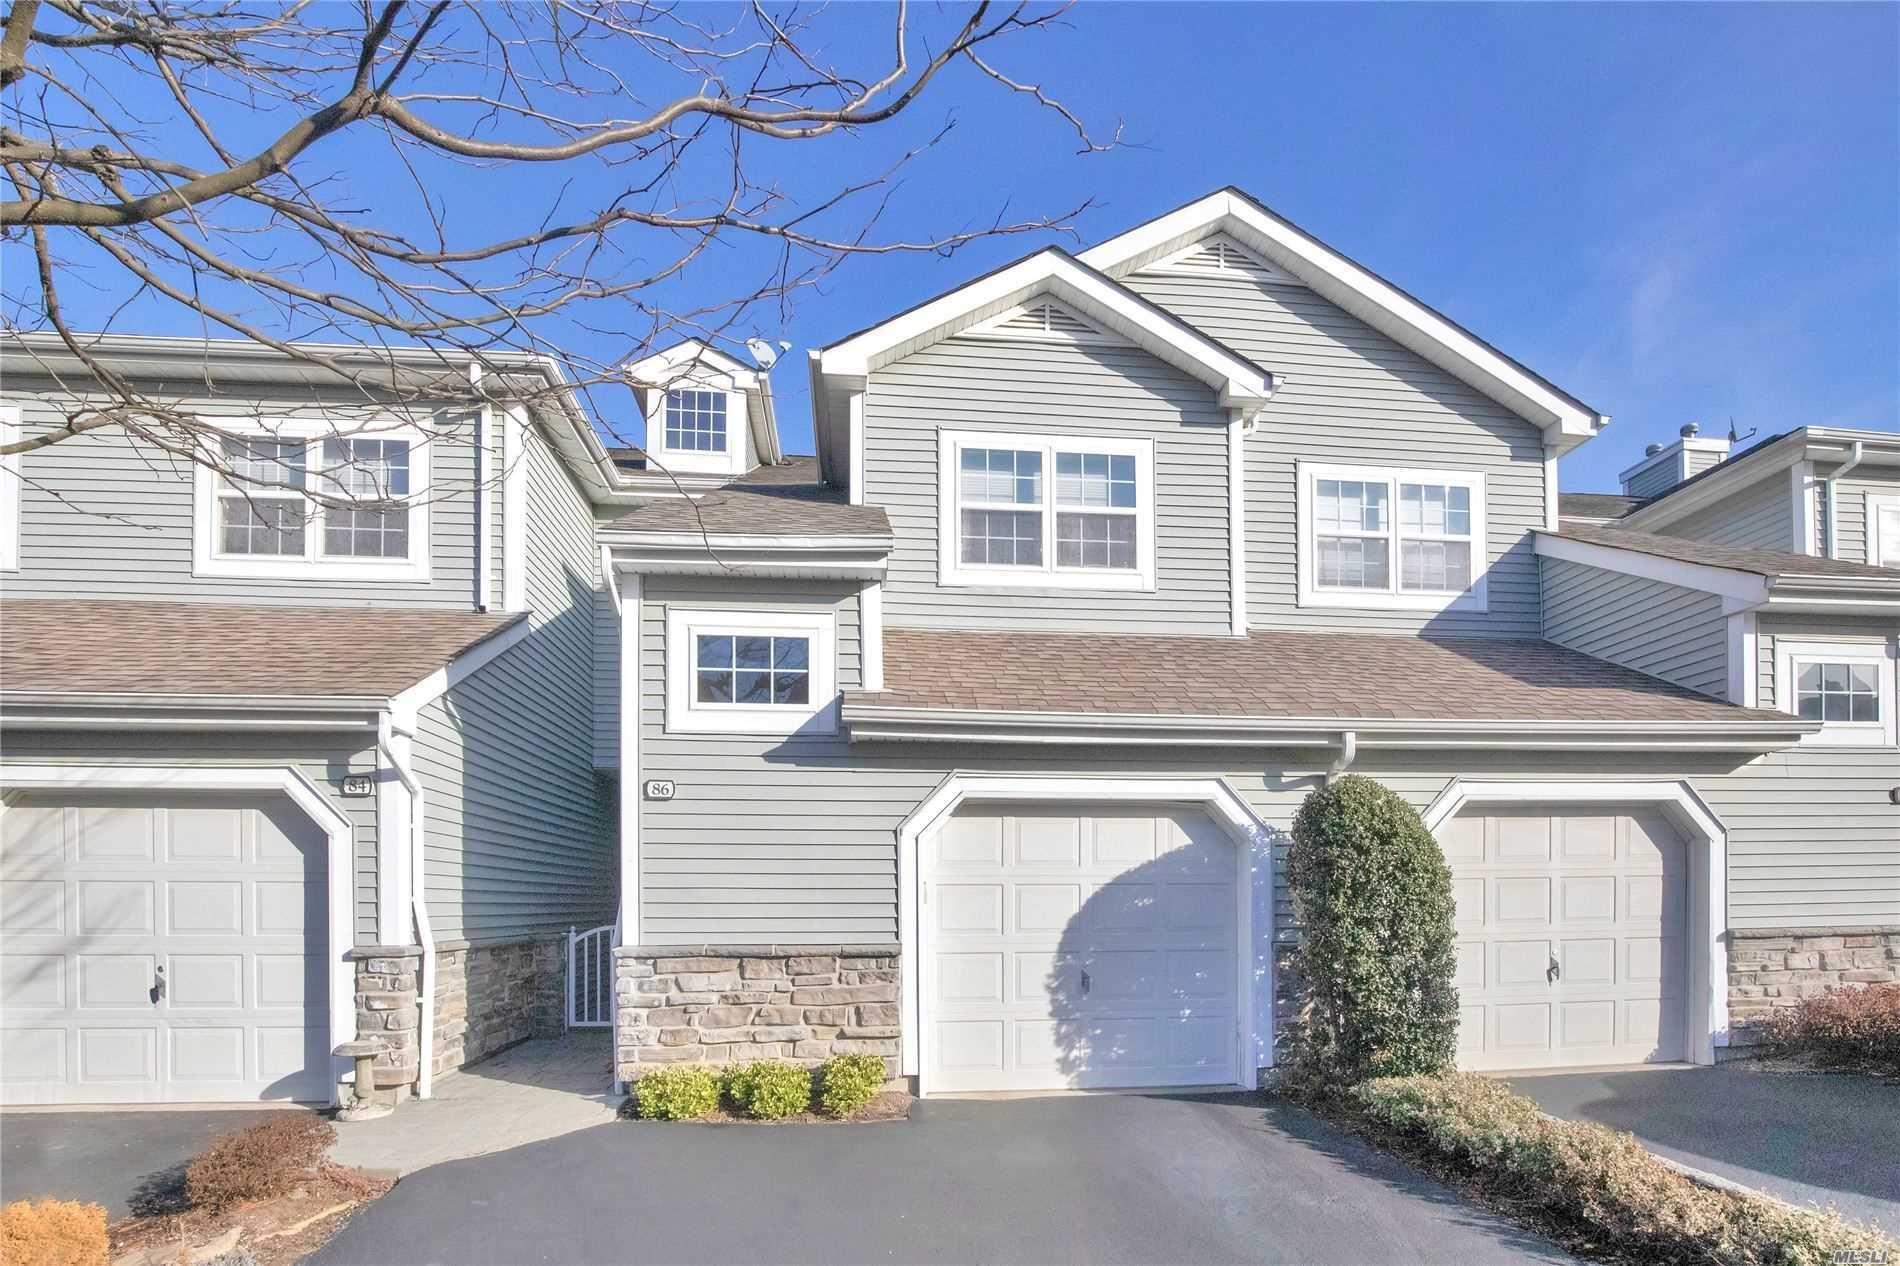 86 Carriage Lane, Plainview, NY 11803 - MLS#: 3187562